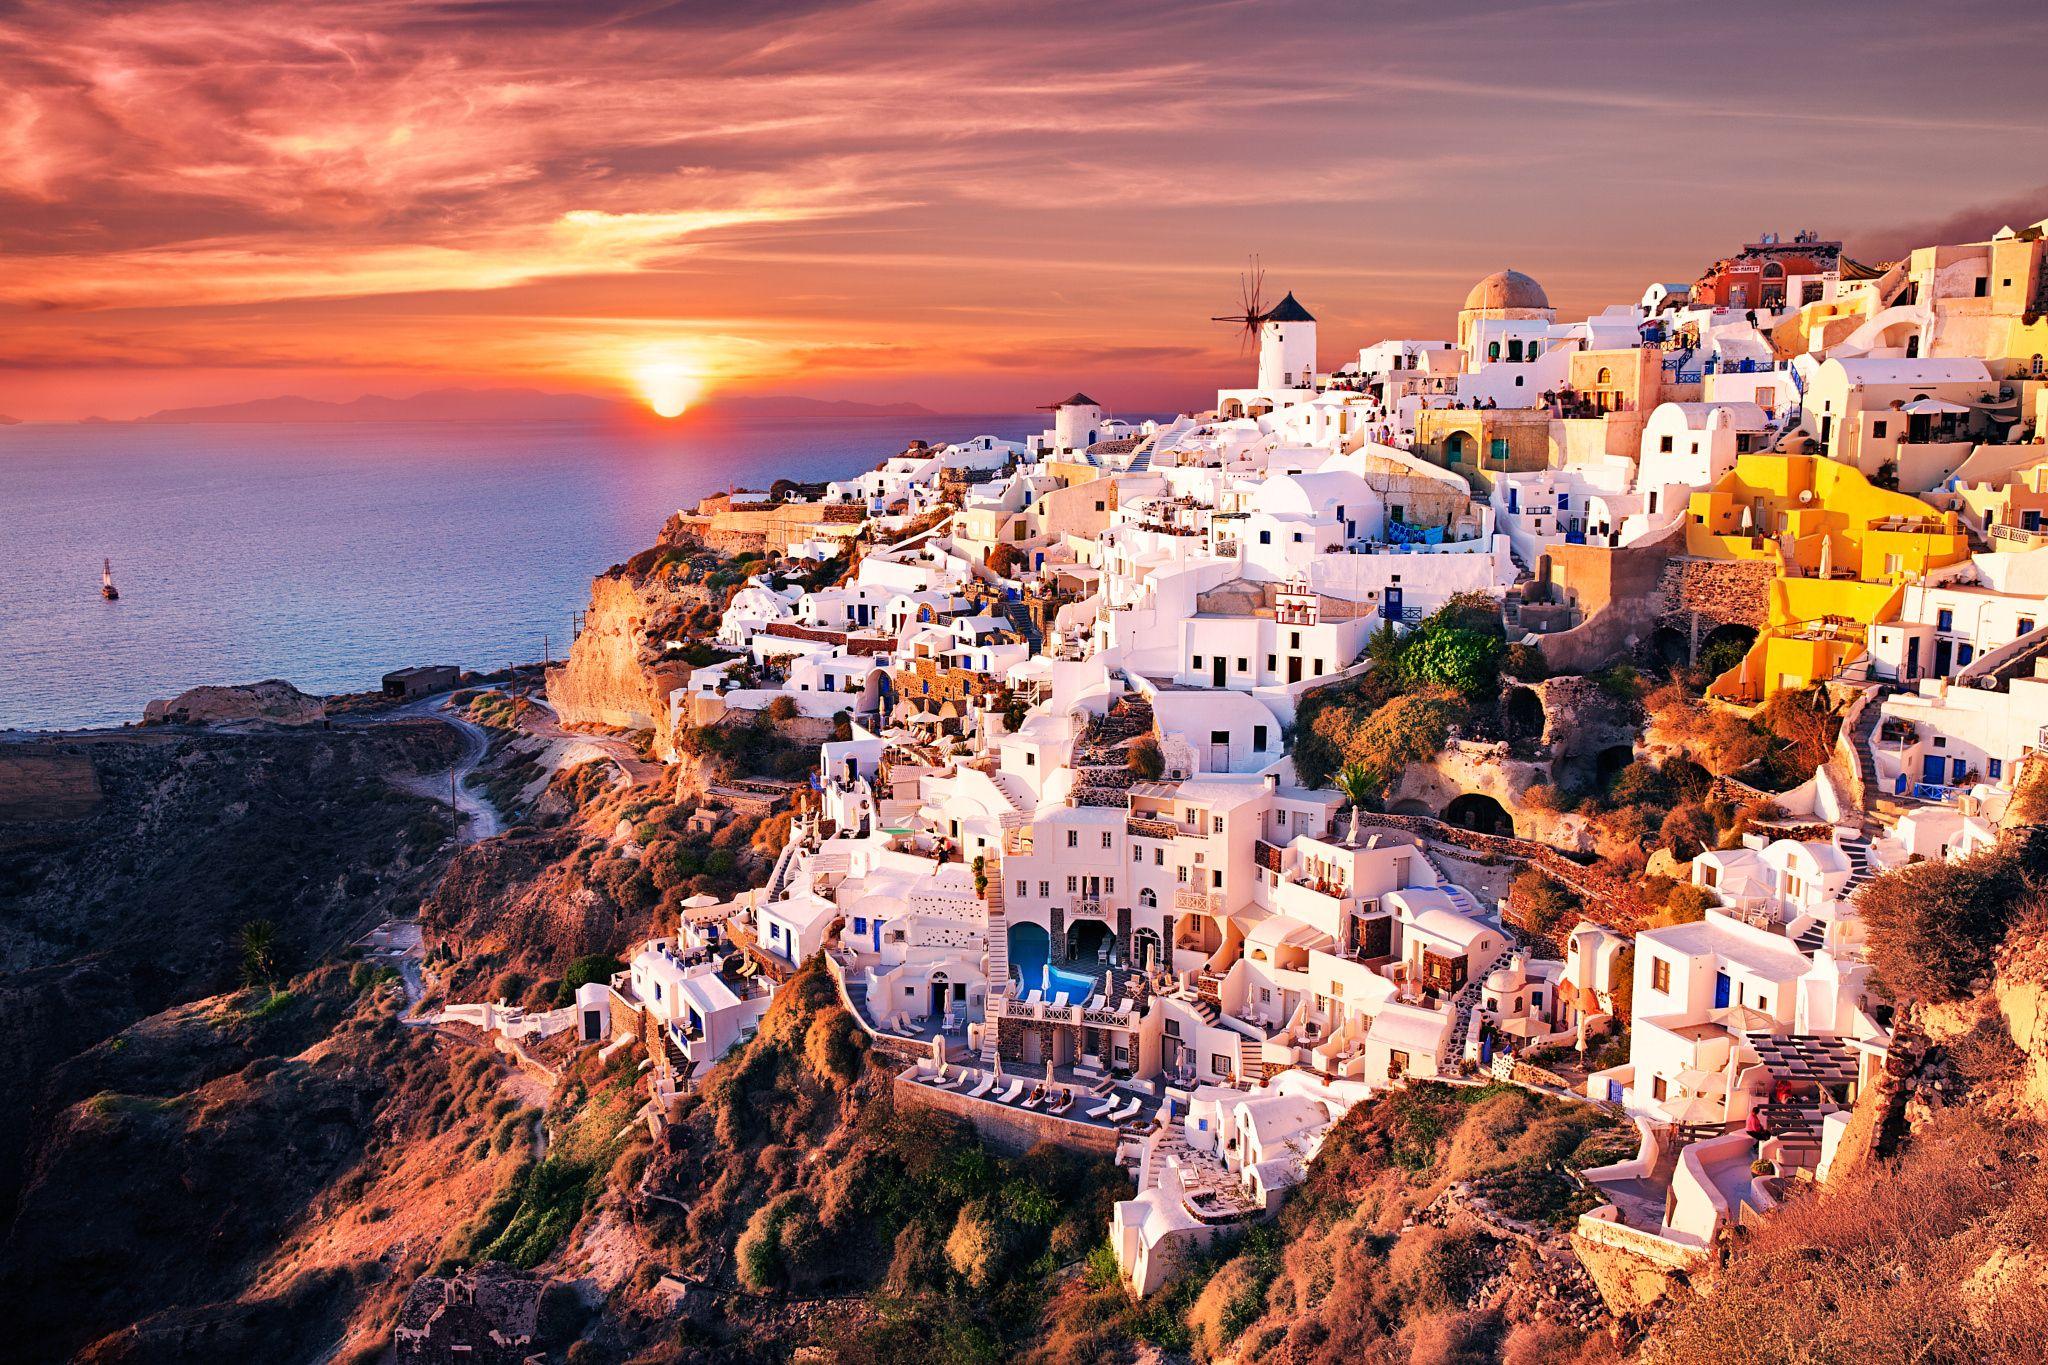 45 Santorini Sunset Wallpapers   Download at WallpaperBro 2048x1365